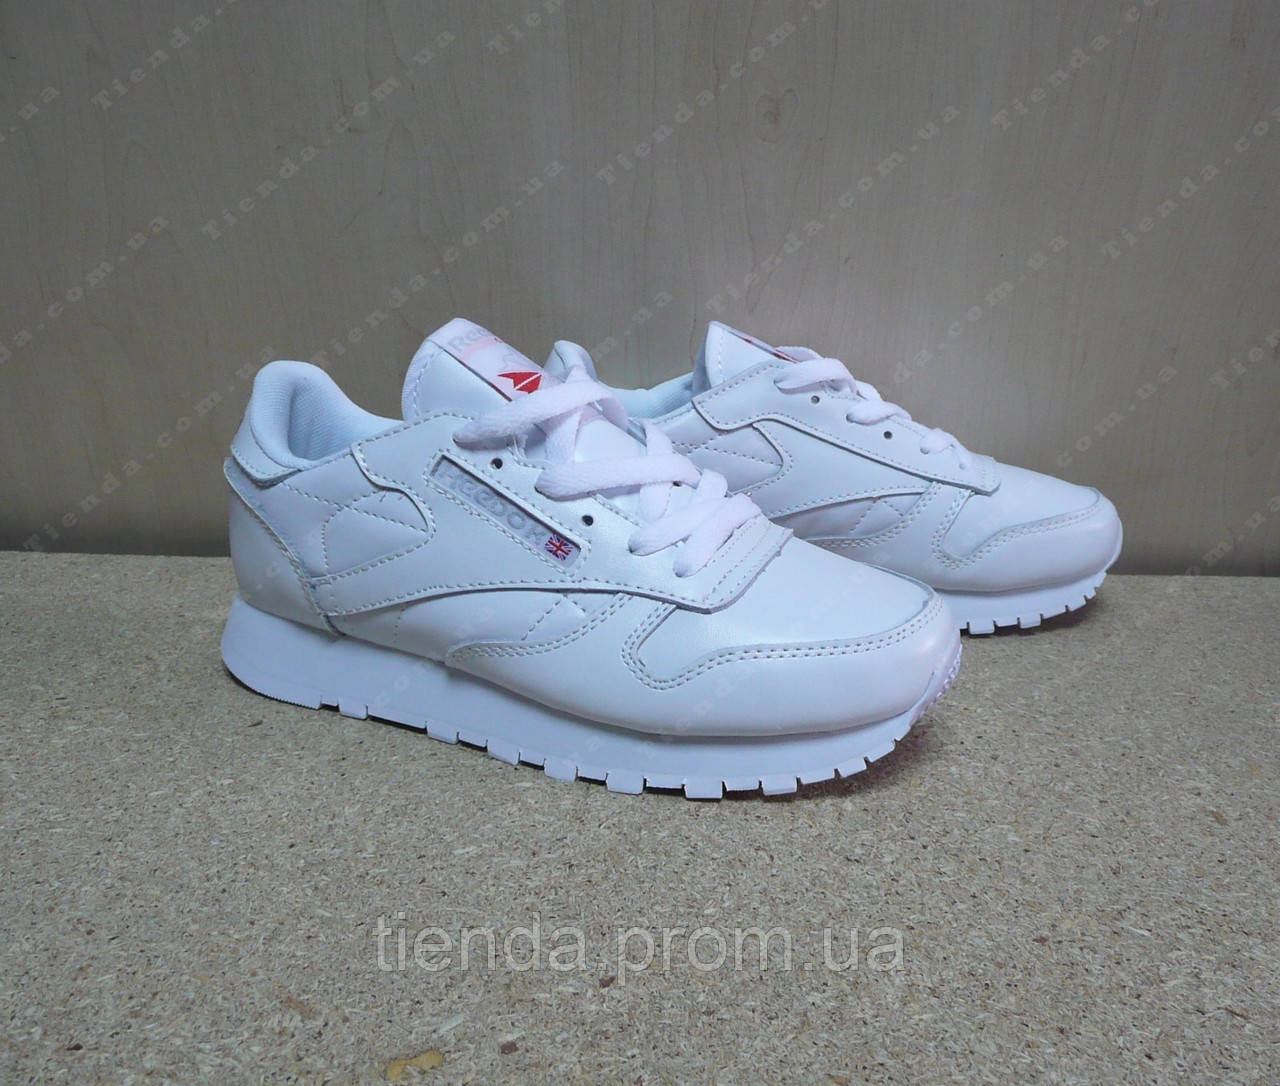 3ebcbd32282e21 Женские Кроссовки Reebok Classic Leather белые: продажа, цена в ...